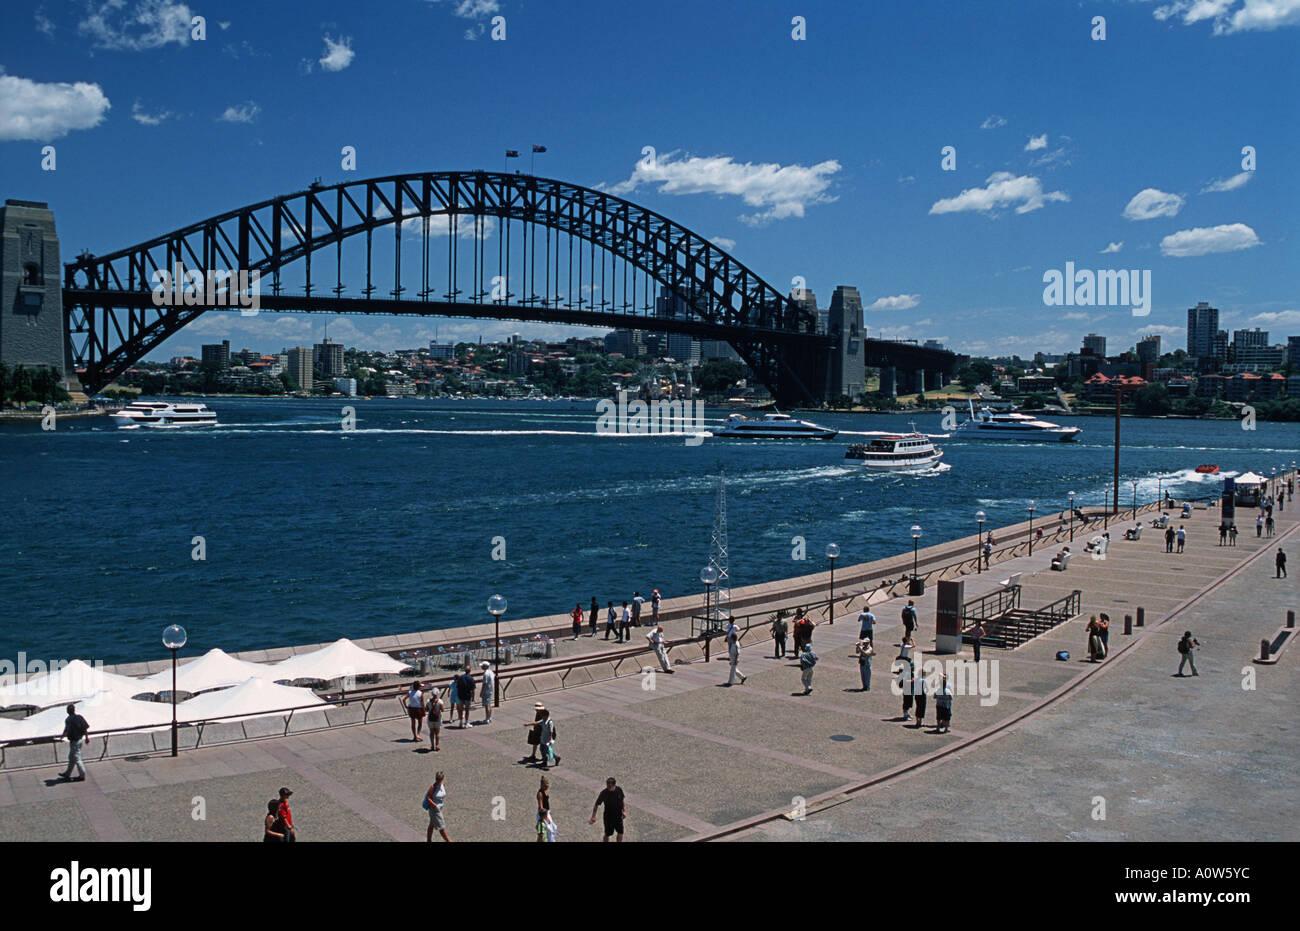 View of the famous Sydney Harbour Bridge Sydney New South Wales Australia - Stock Image